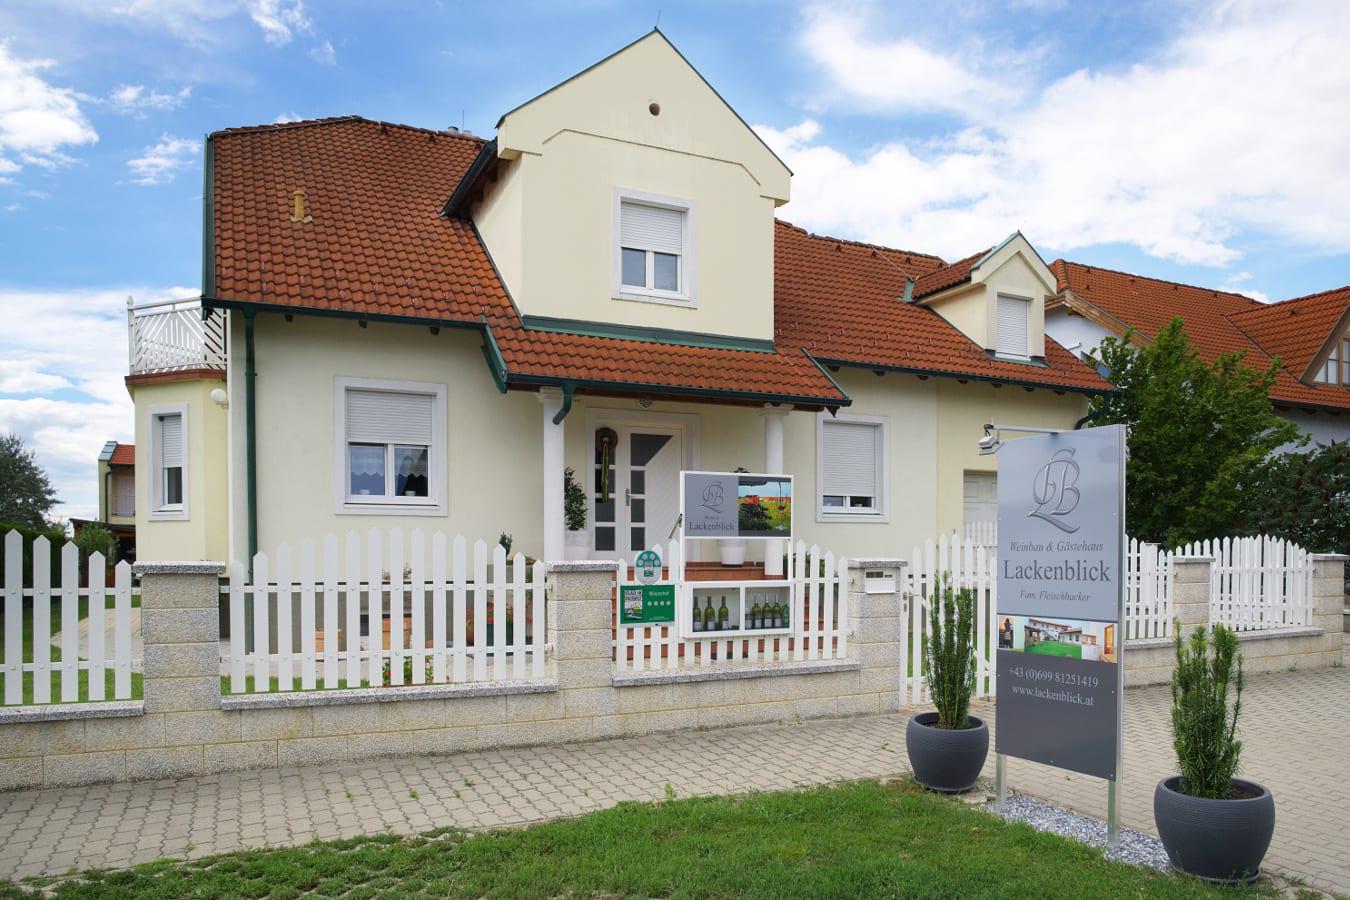 Gästehaus u. Weinbau Lackenblick